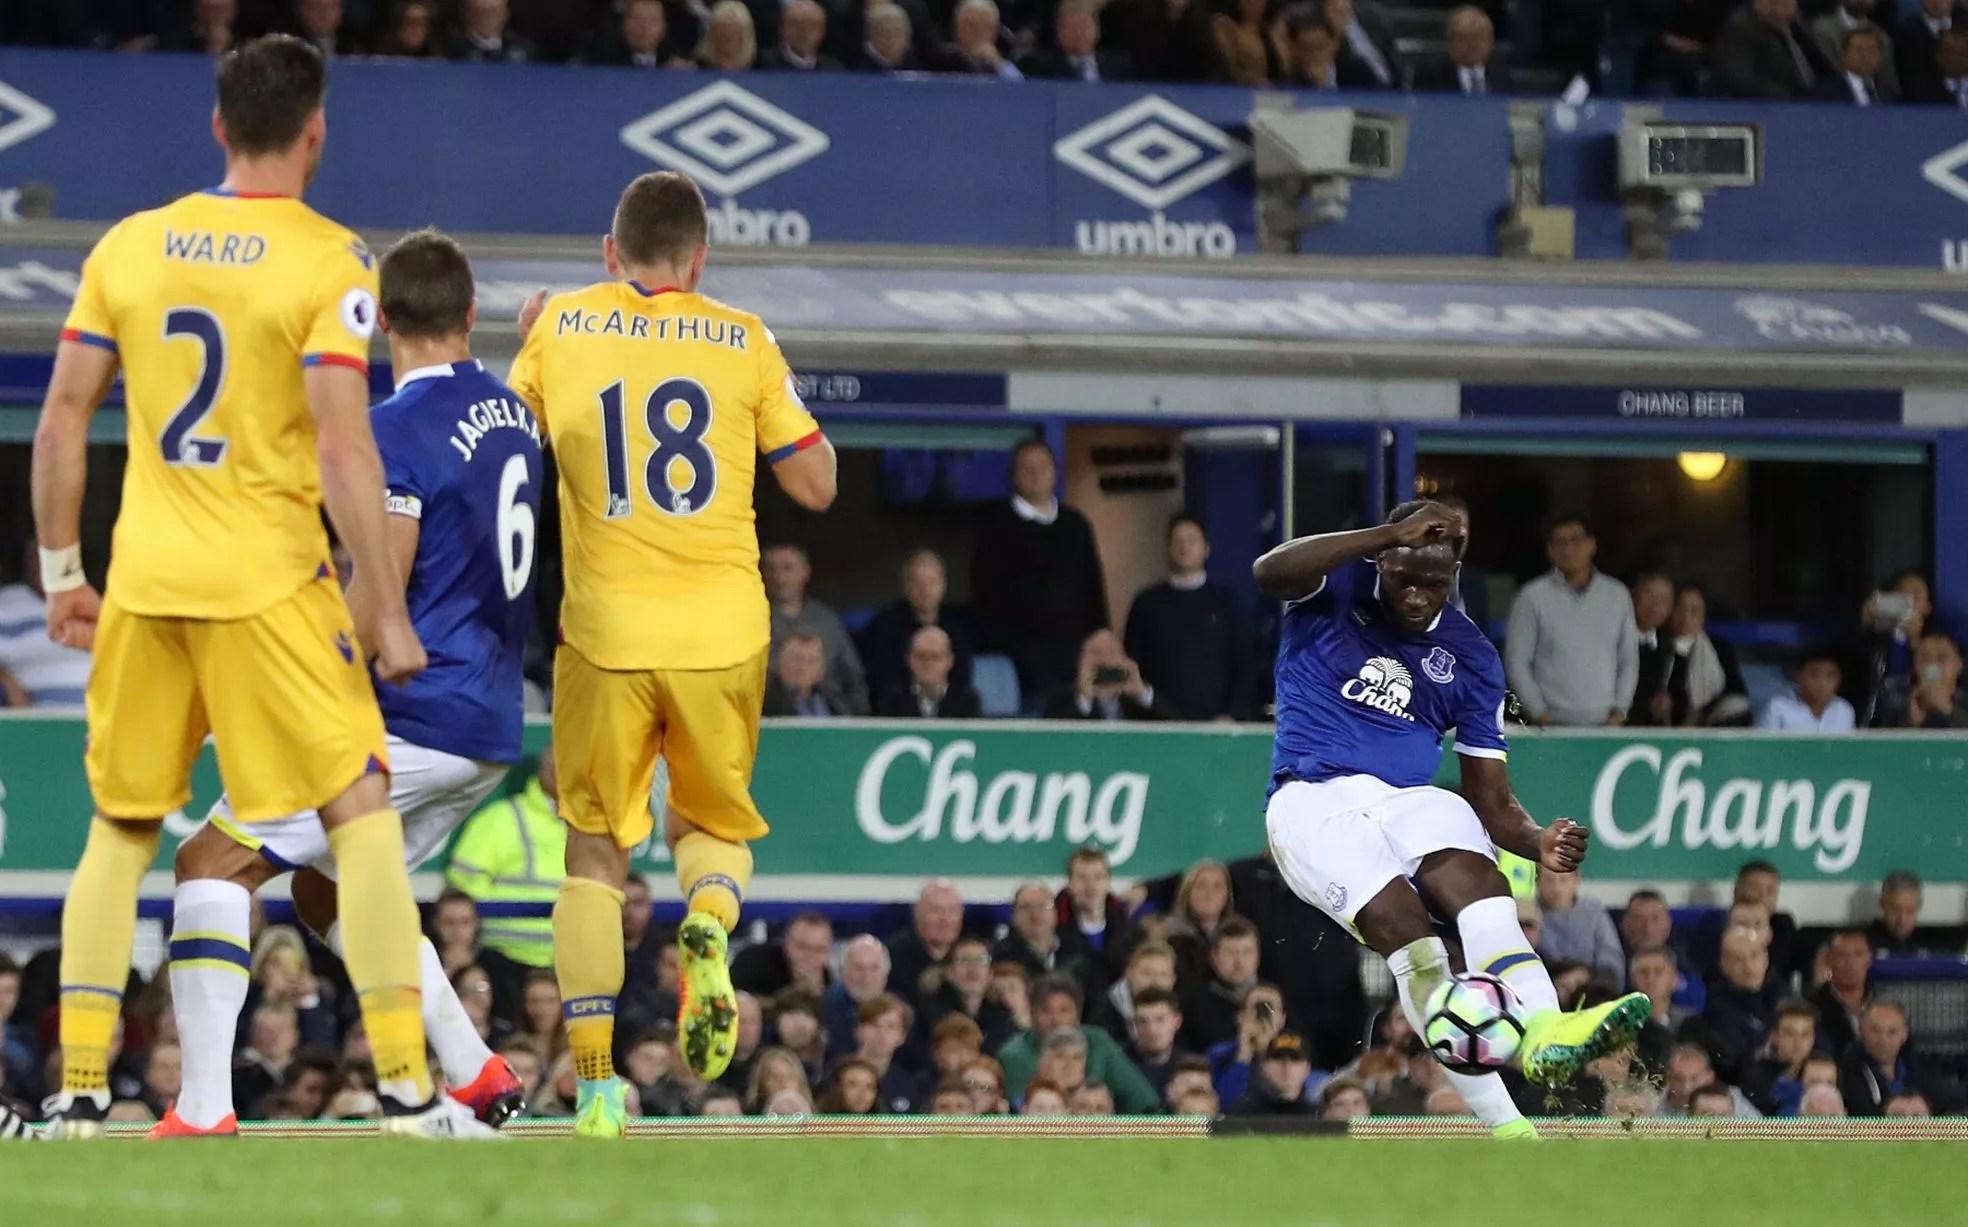 Romelu Lukaku scores the first goal